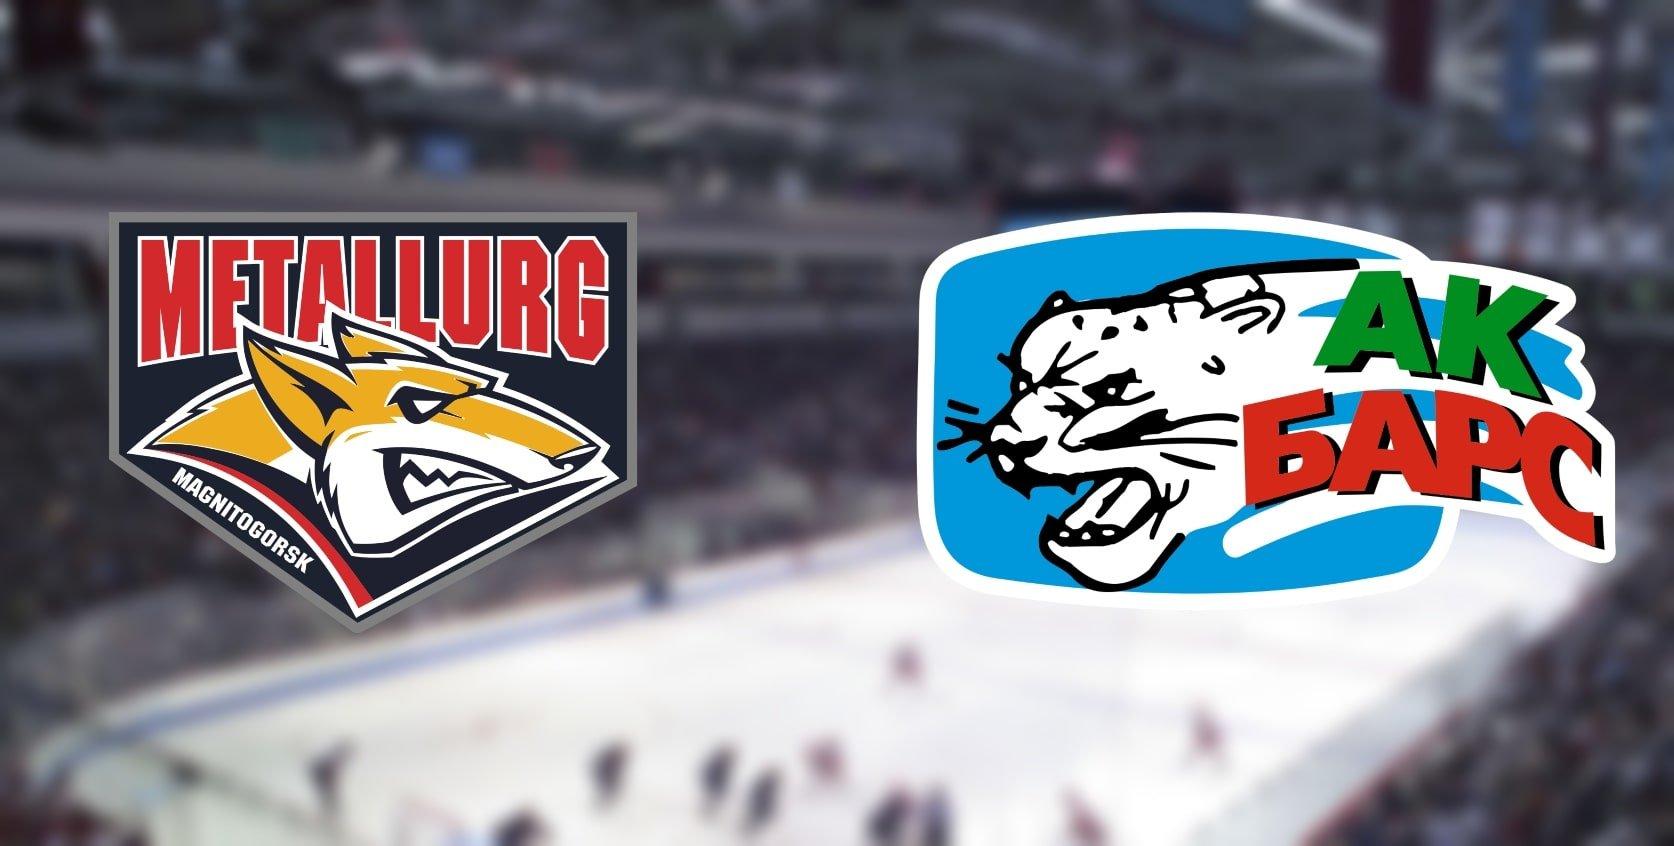 Metallurg Mg vs Ak Bars Prediction: 21.09.2019 KHL Match